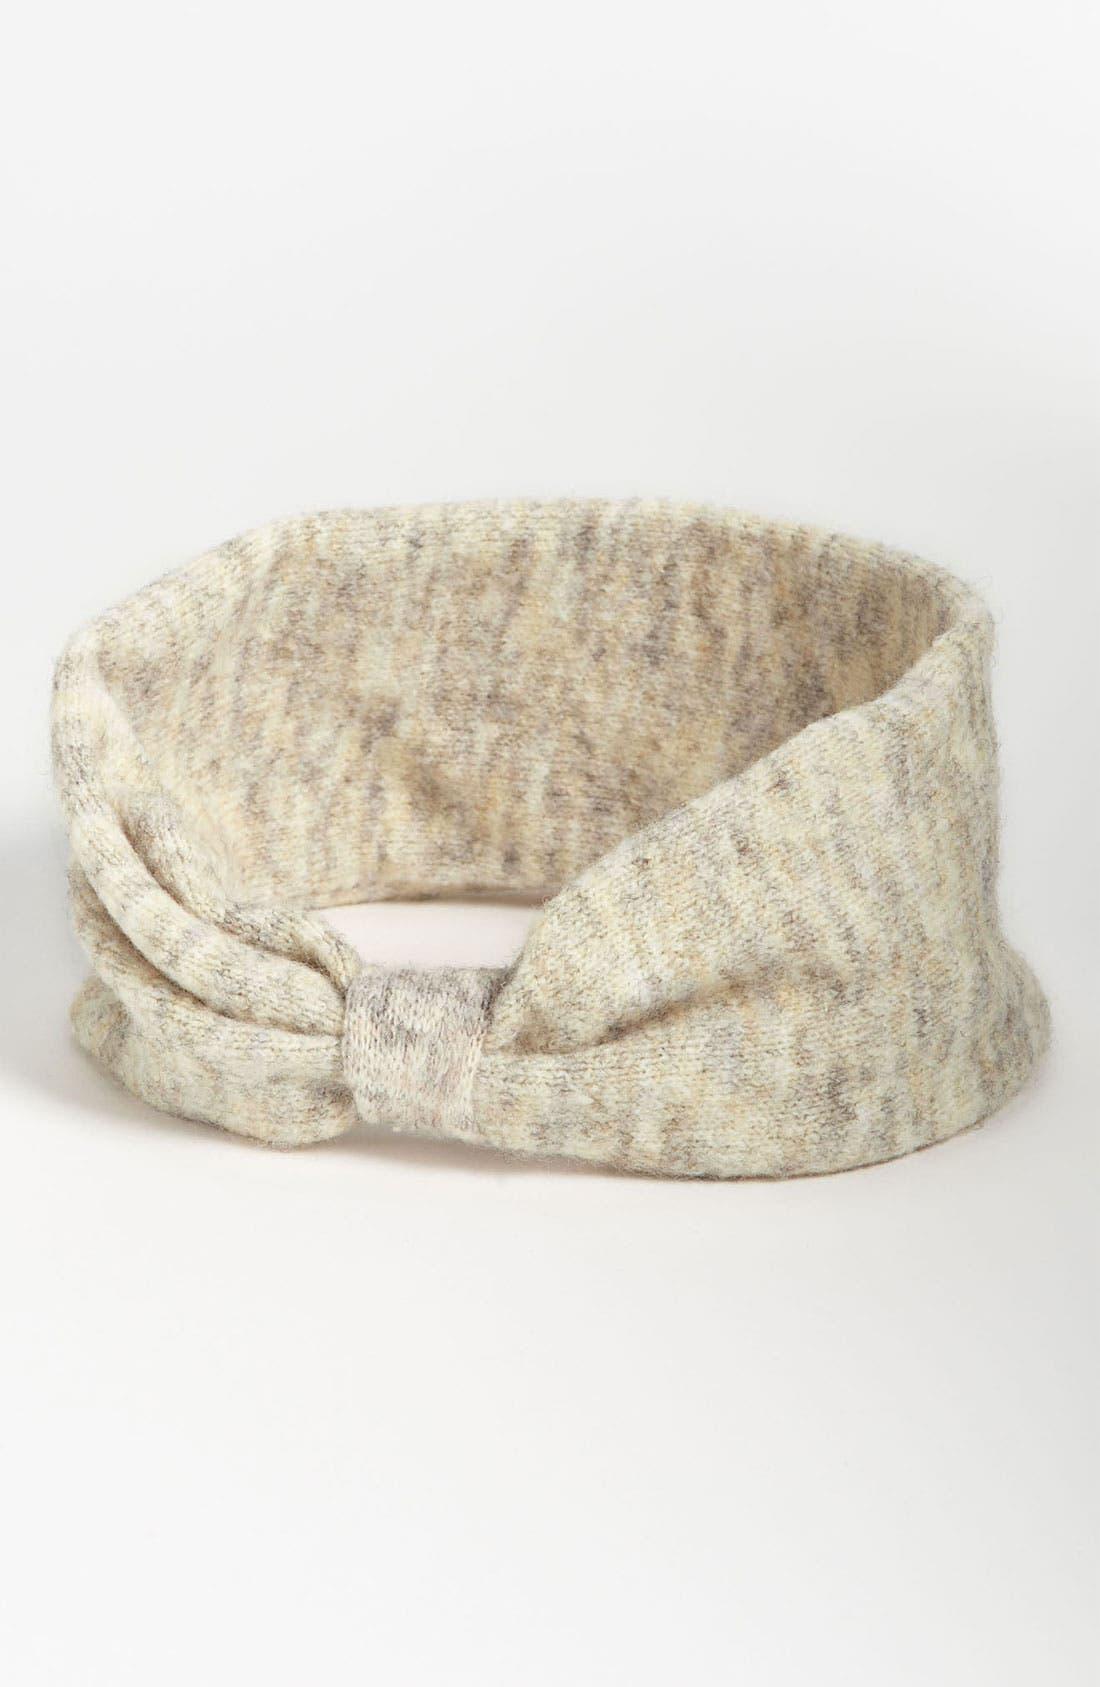 Alternate Image 1 Selected - BP. 'Bow Cinch' Headband